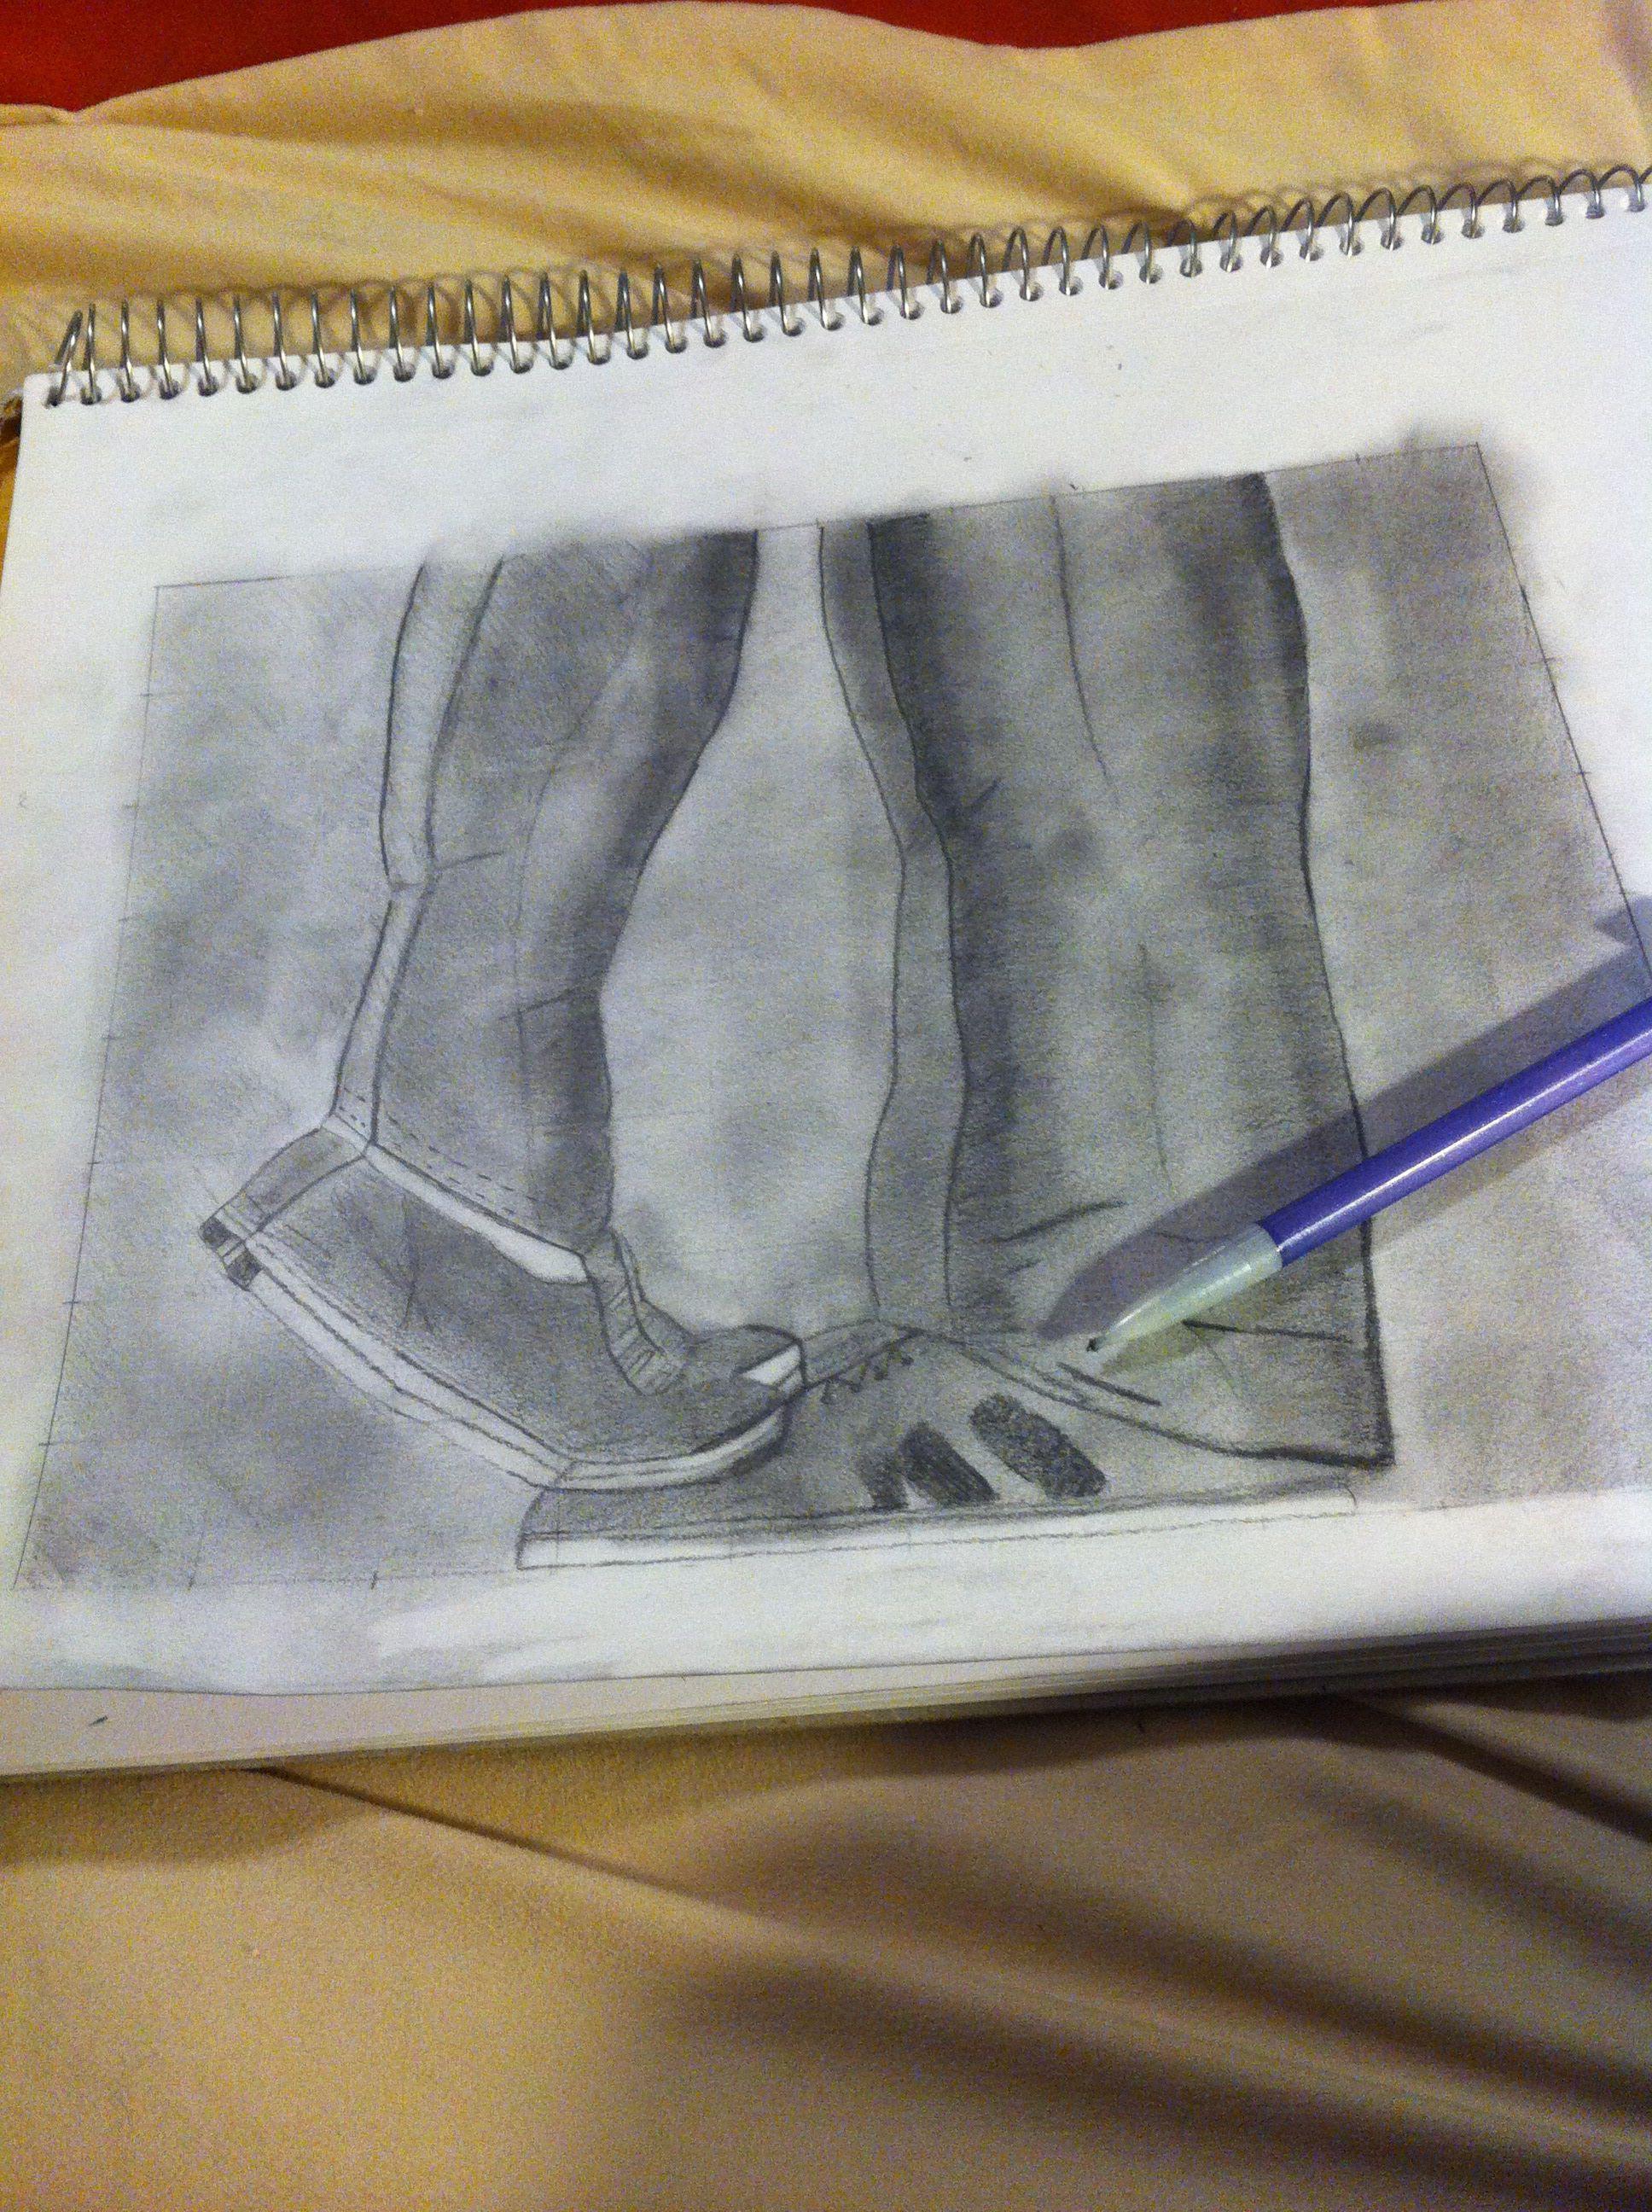 Nighttime drawing